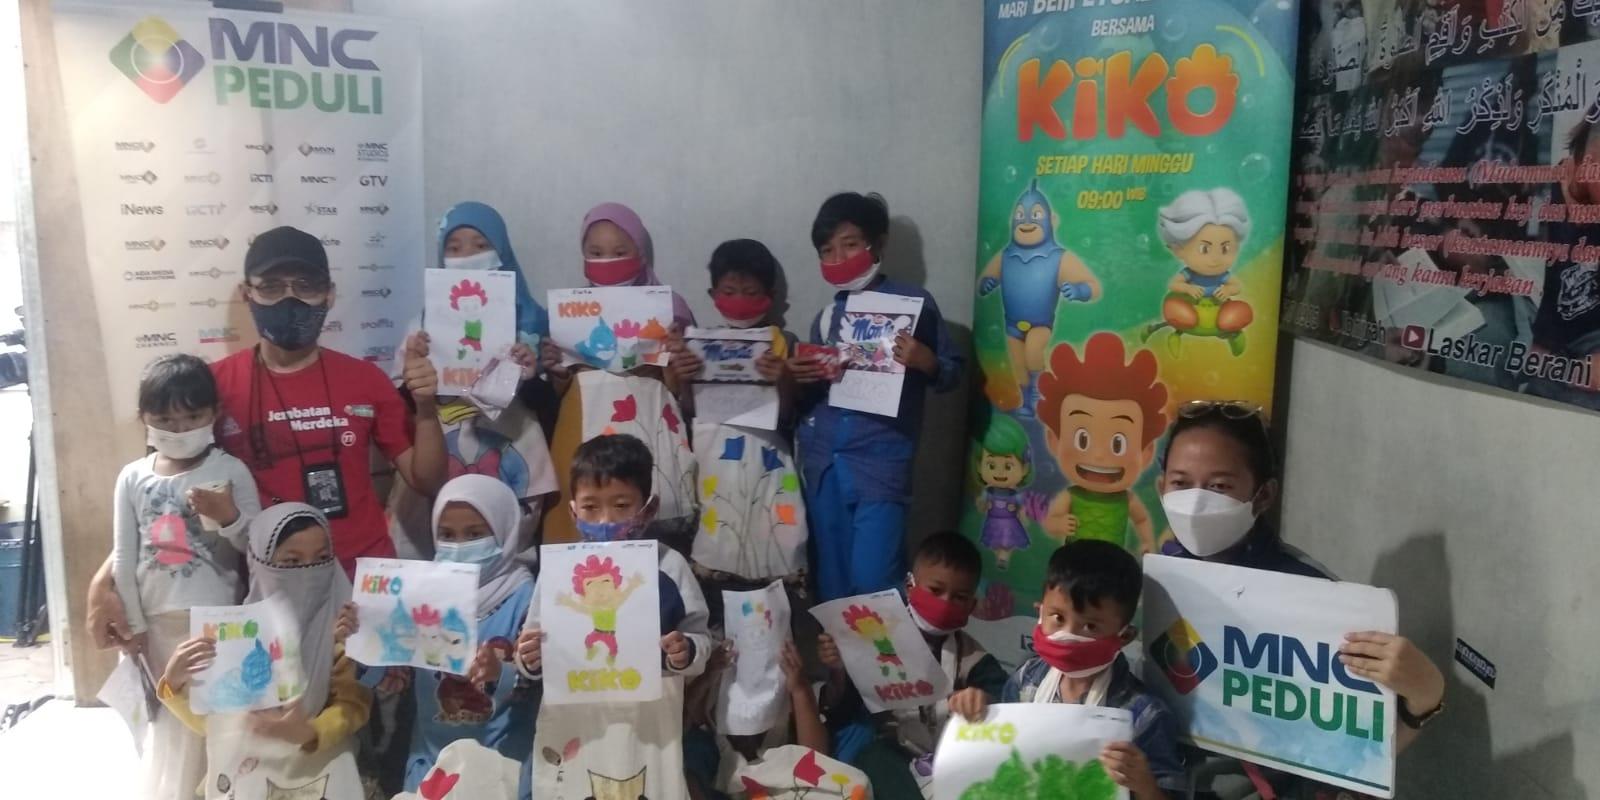 https: img.okezone.com content 2021 08 25 337 2461052 serunya-anak-anak-kampung-lio-menggambar-dan-mewarnai-bersama-mnc-peduli-dan-mnc-animation-KMKqPwjW1z.jpg